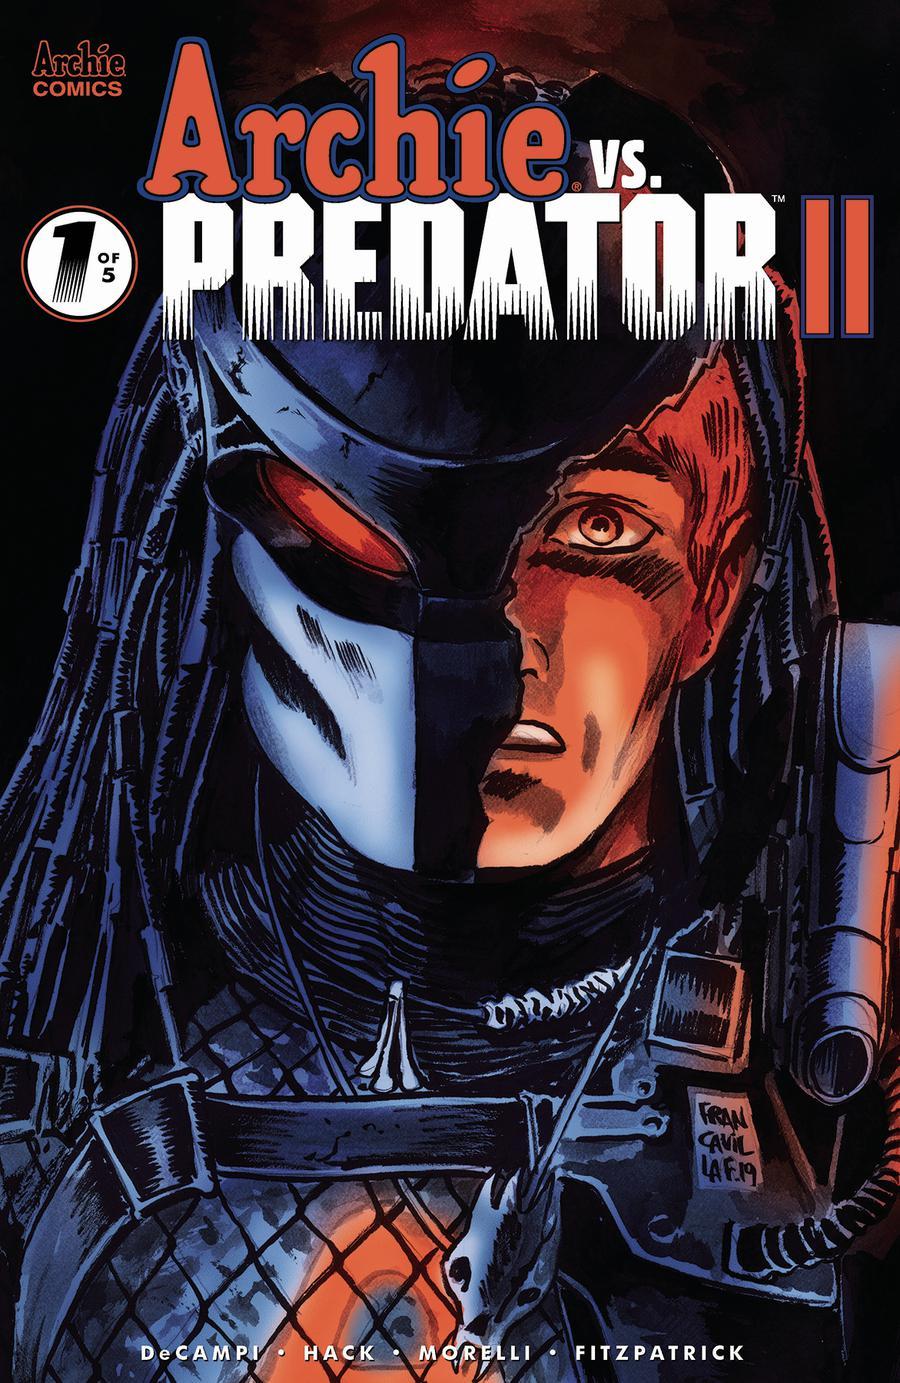 Archie vs Predator II #1 Cover D Variant Francesco Francavilla Cover